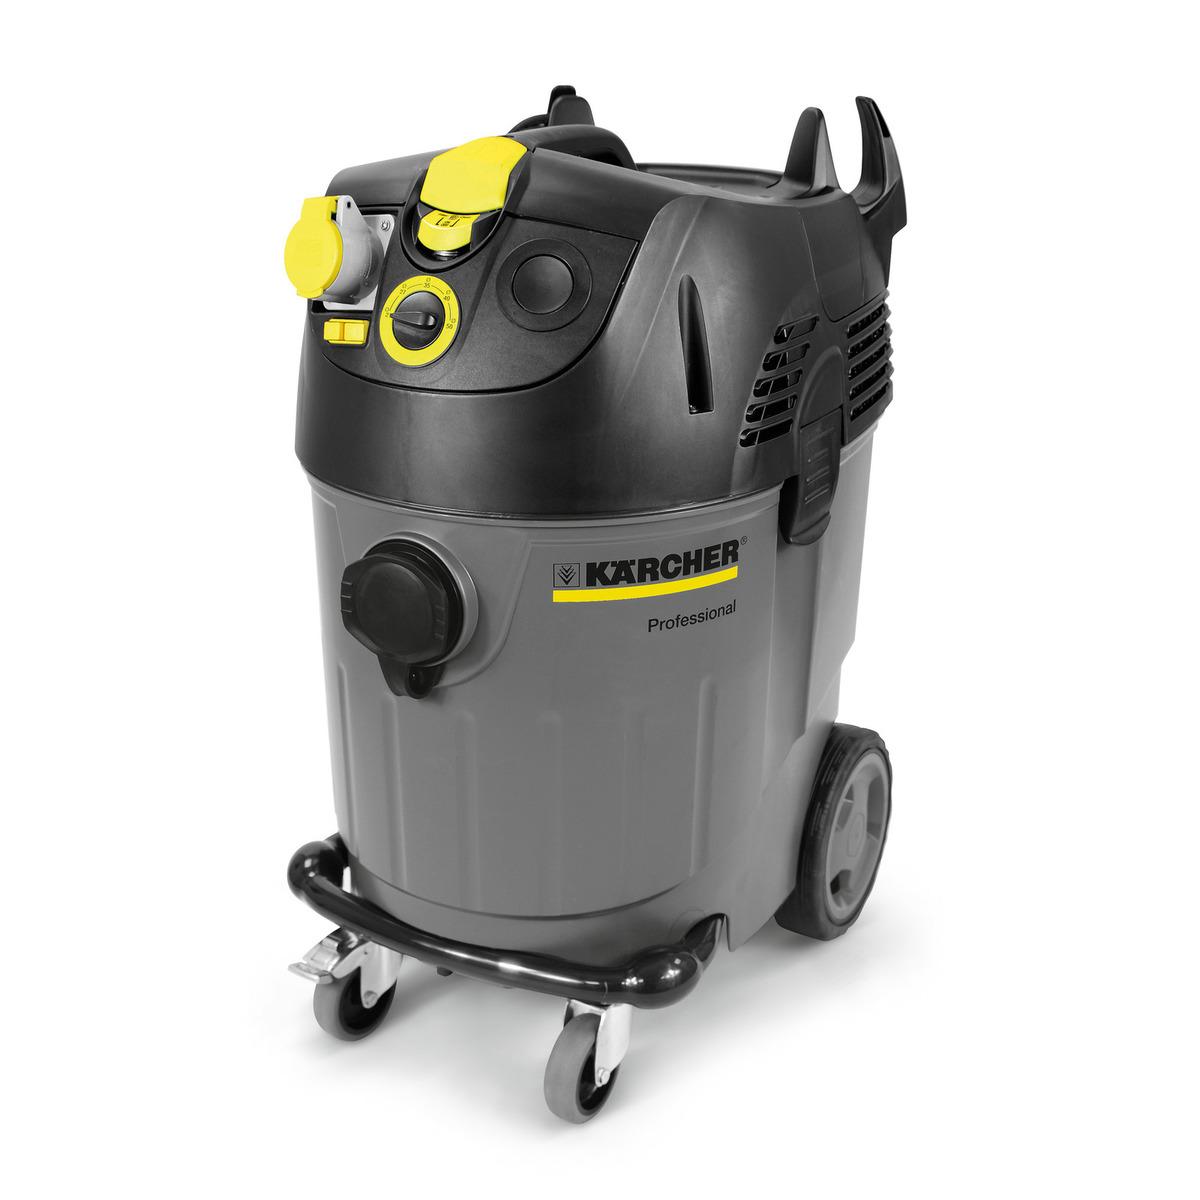 Karcher NT 45/1 Tact 110v Wet & Dry Vacuum Cleaner